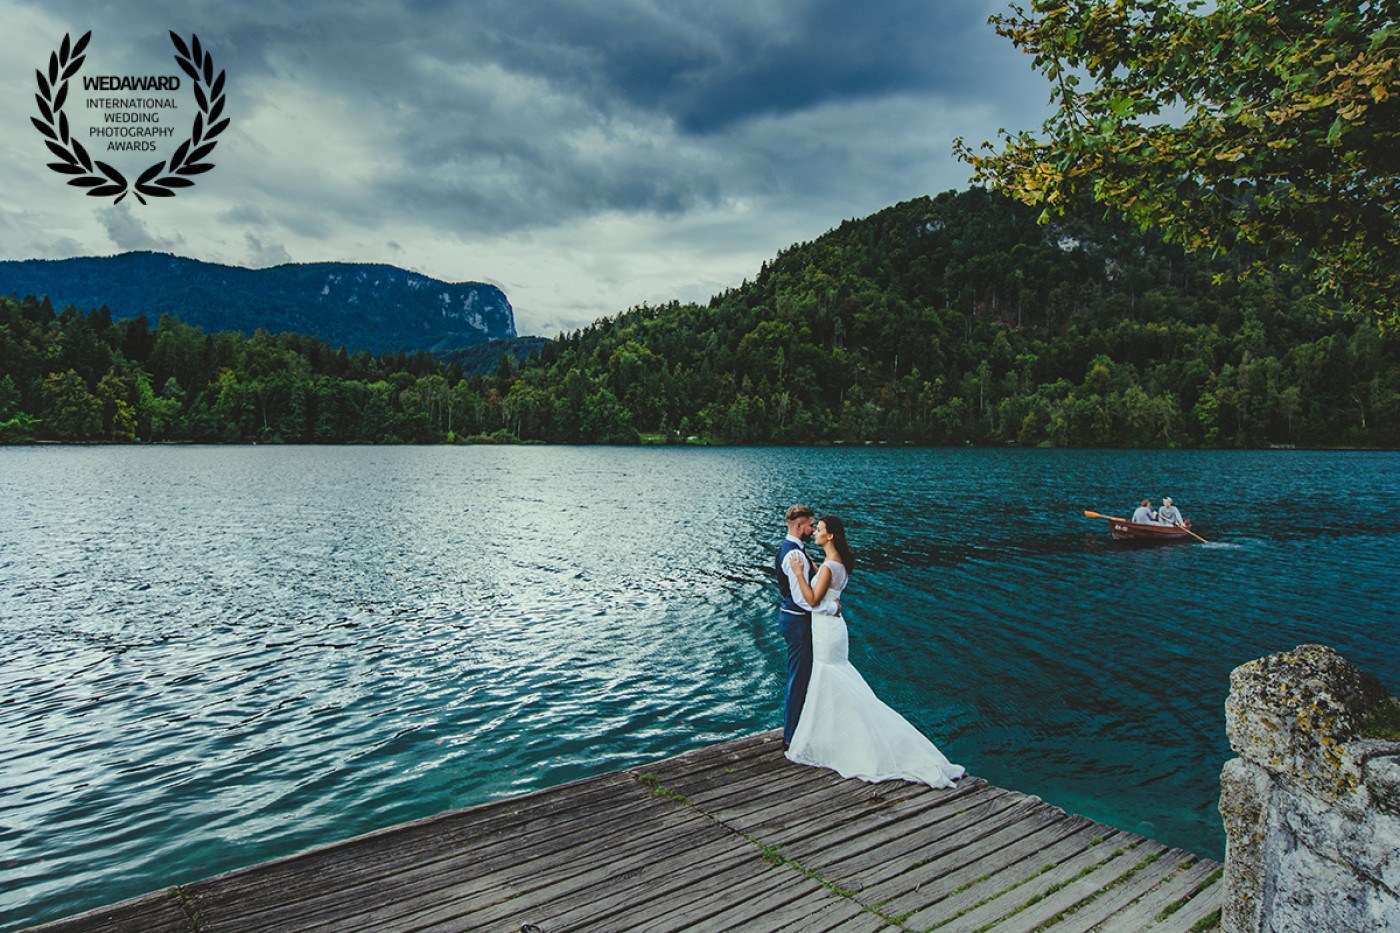 Wedaward Wedding Photographer Gavin Conlan (gavinconlanphoto ...